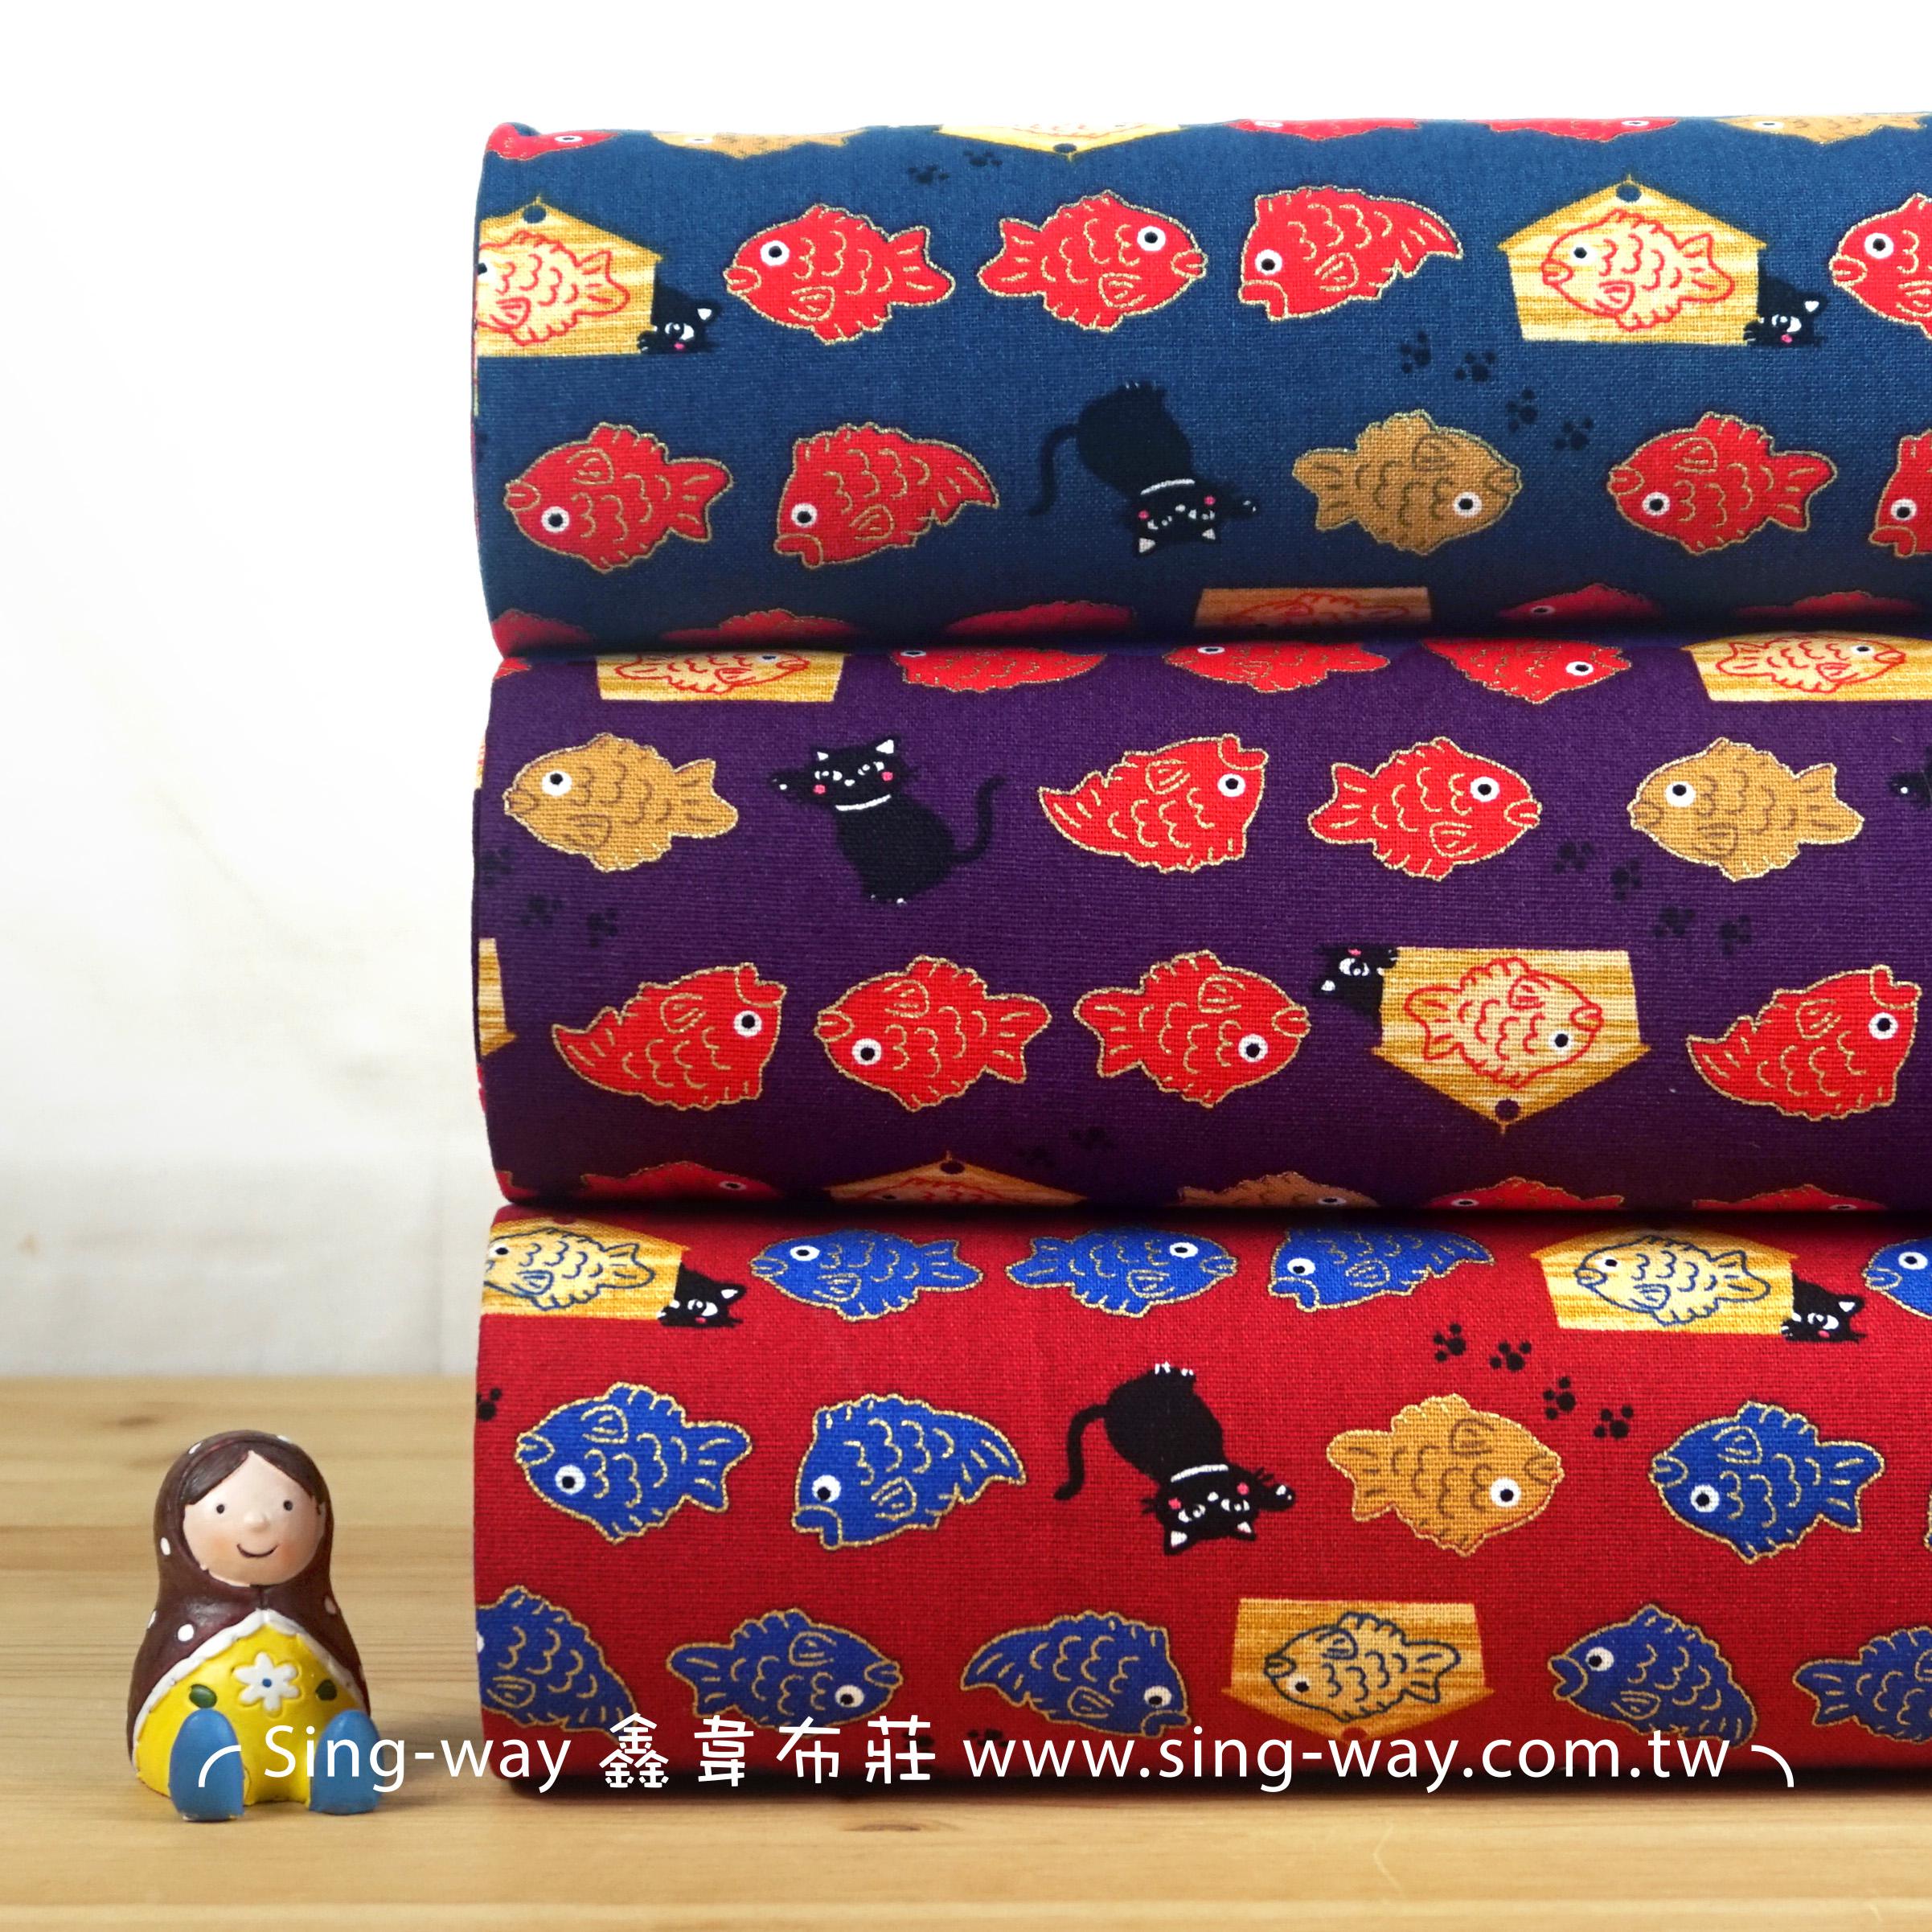 燙金貓吃鯛魚燒(大特價)日式和風燙金邊 貓咪 喵喵 たい焼き 鯛焼き 手工藝DIy拼布布料 CF550626